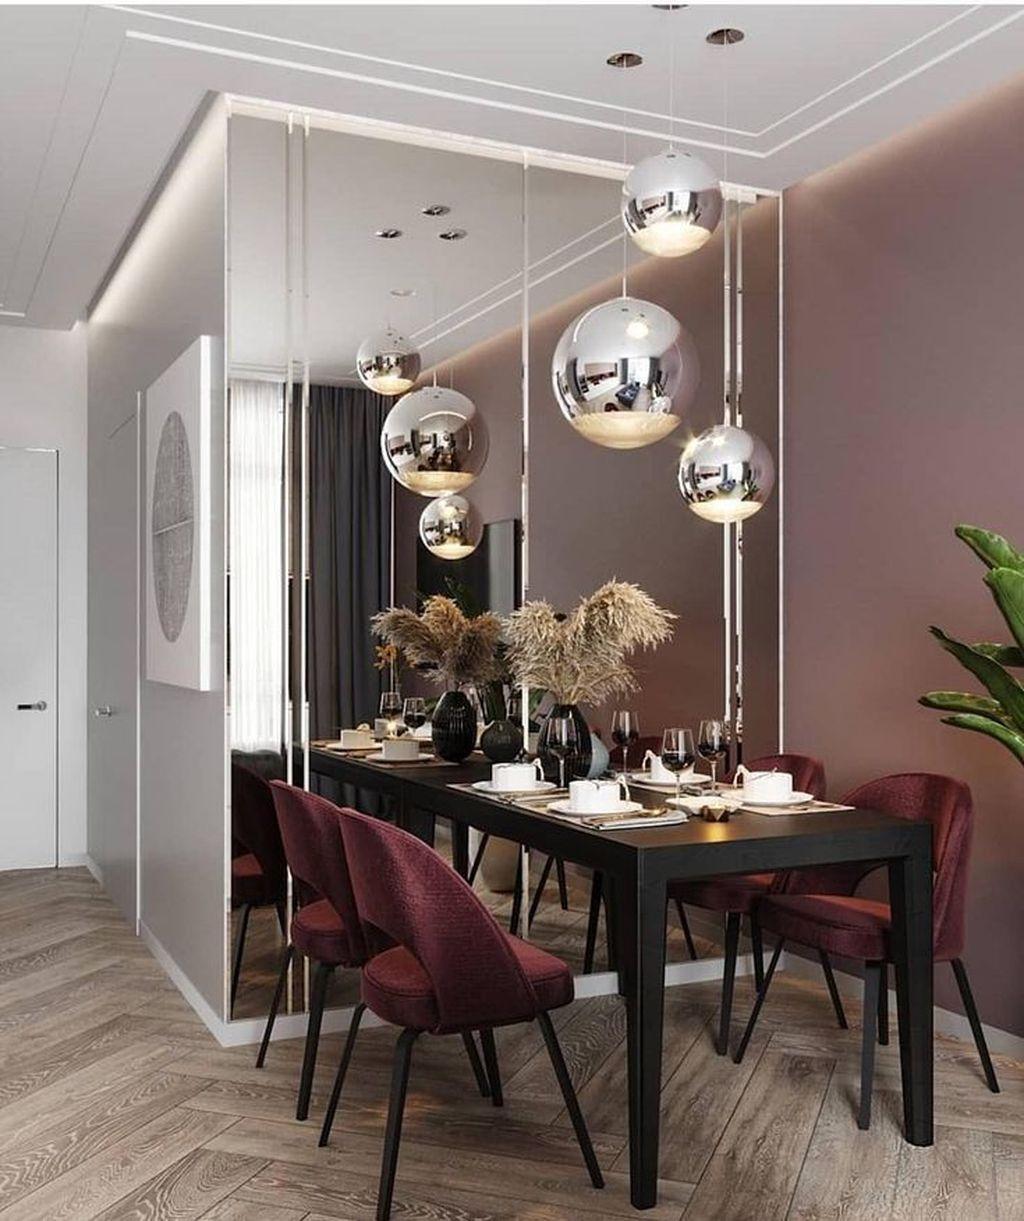 Admirable Modern Interior Design Ideas You Never Seen Before 18